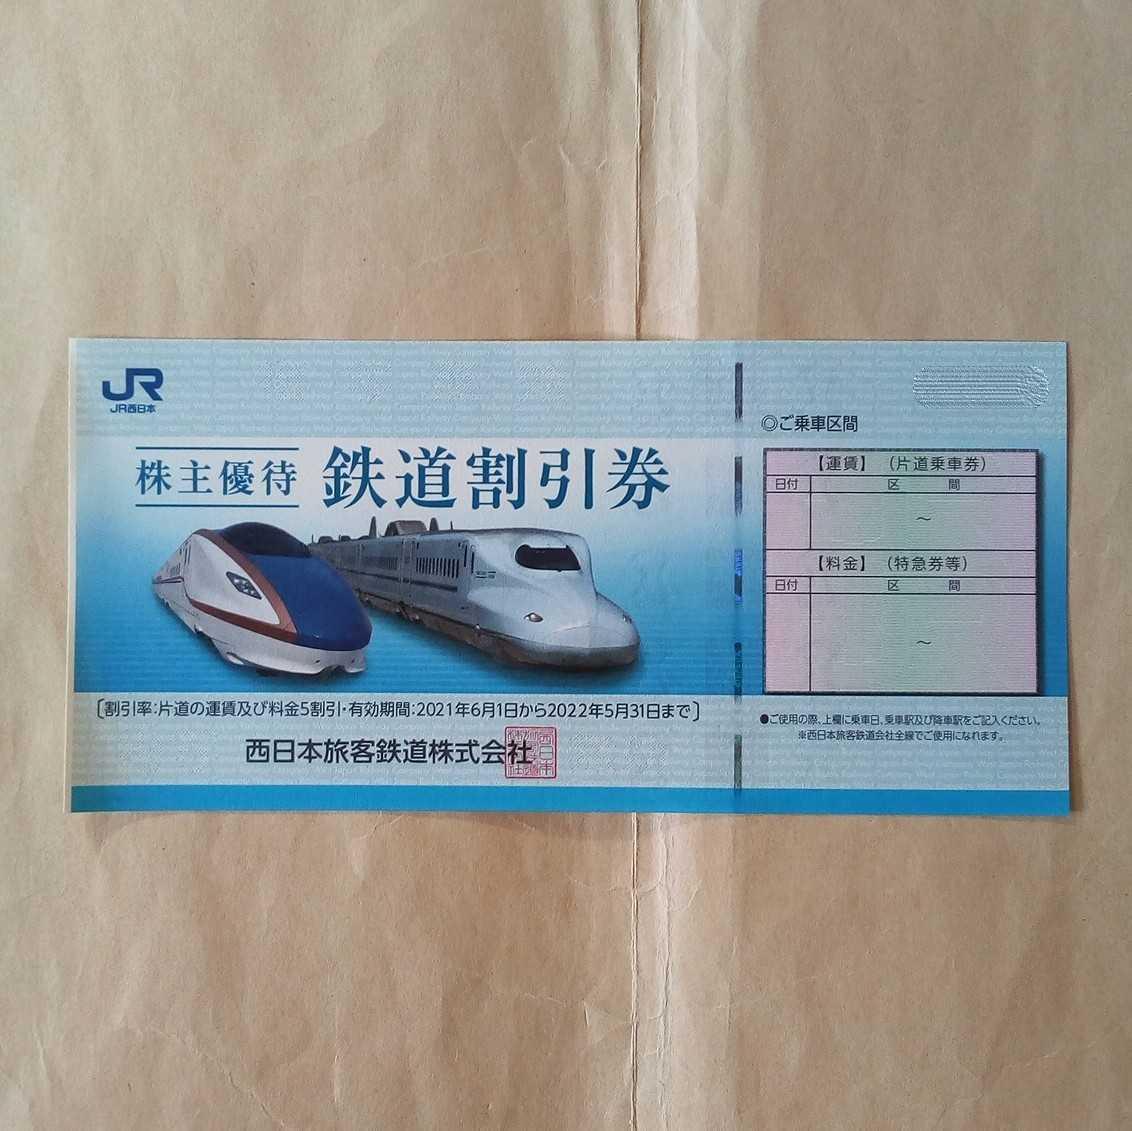 JR西日本株主優待鉄道割引券_画像1